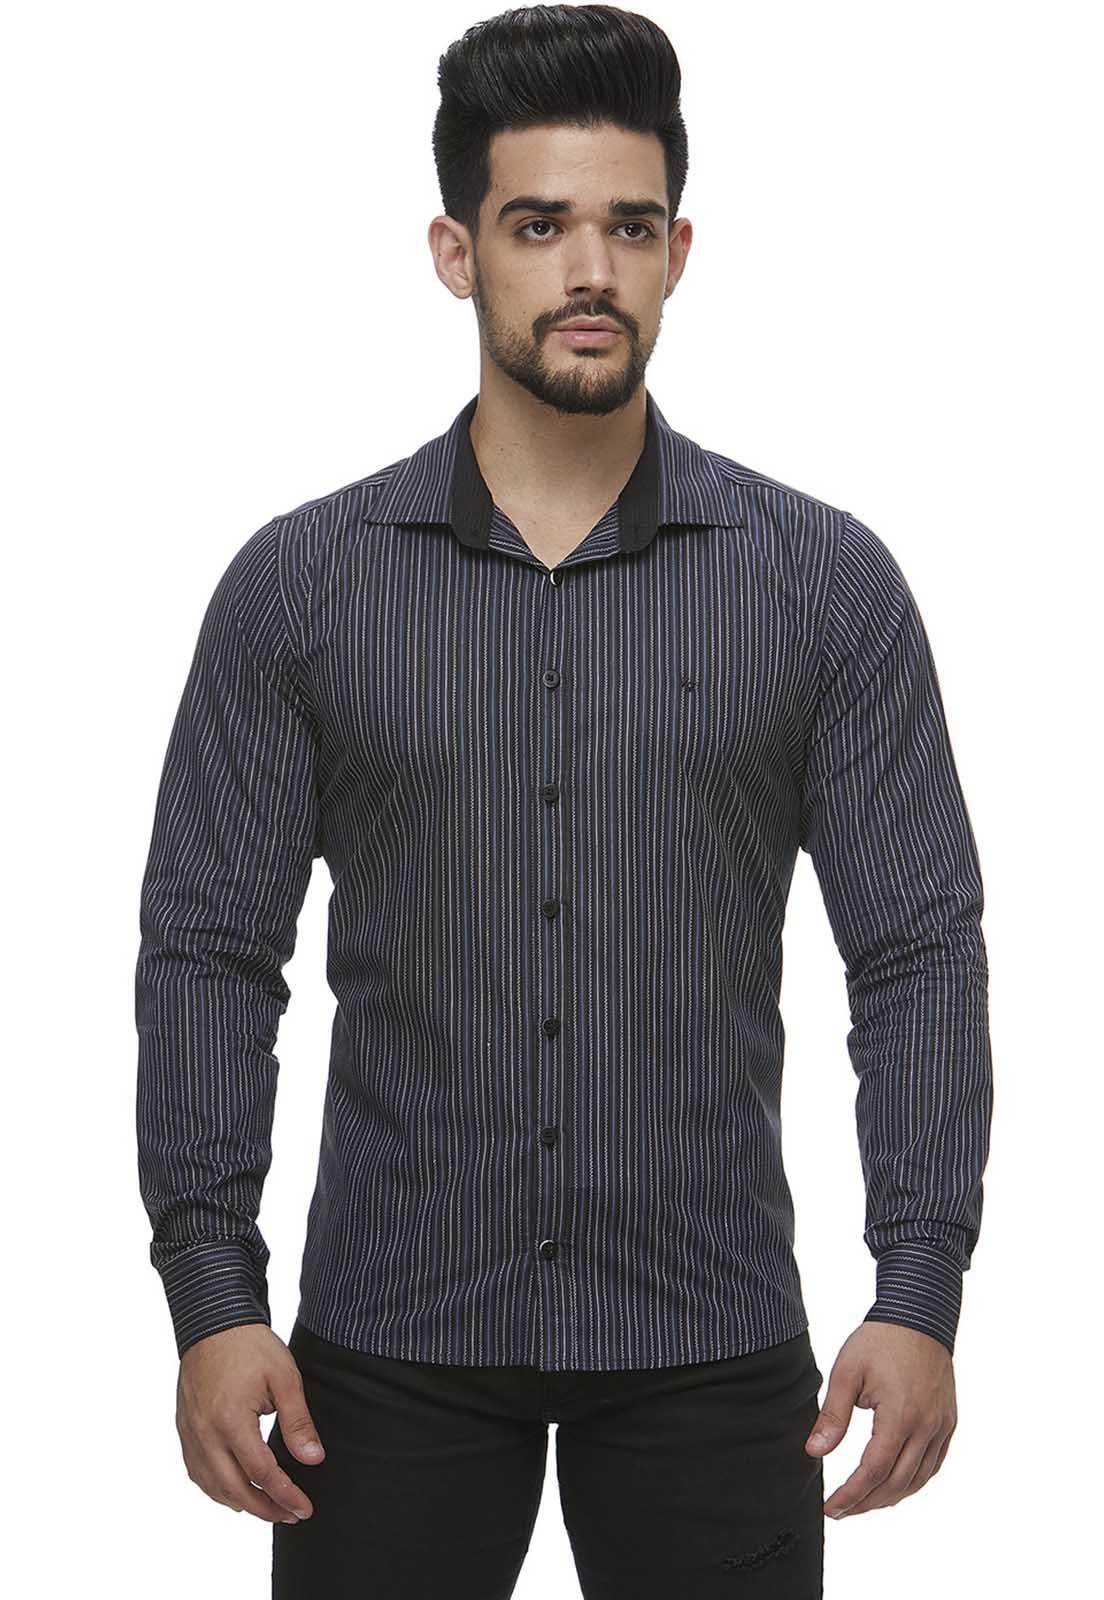 Camisa Zaiko Masculina Listrada Chumbo Manga Longa Única (0998unica)